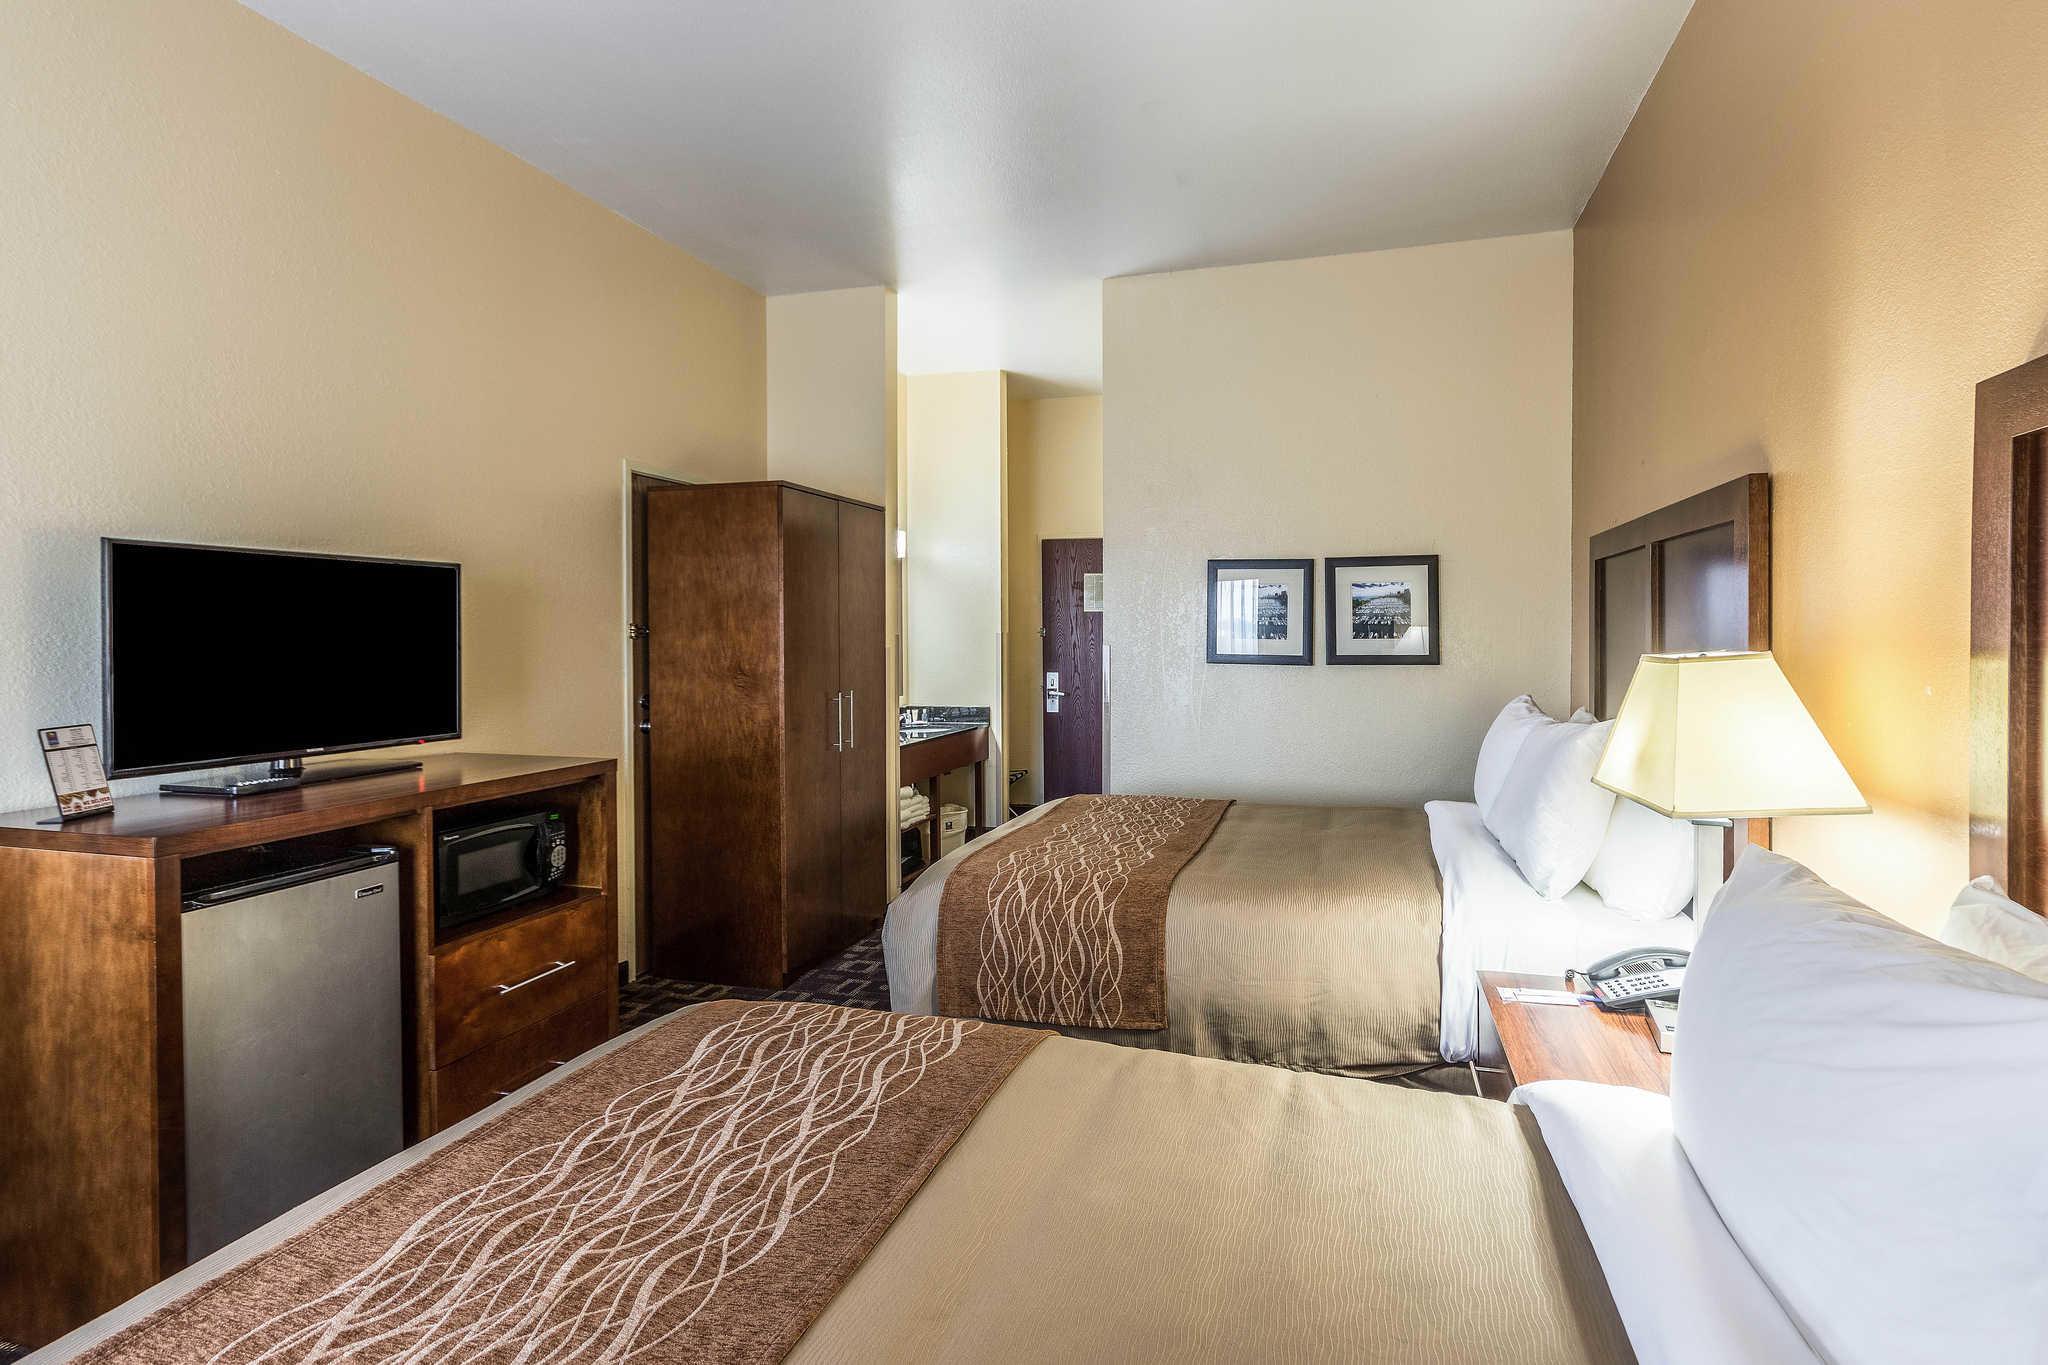 Comfort Inn & Suites North Aurora - Naperville image 15